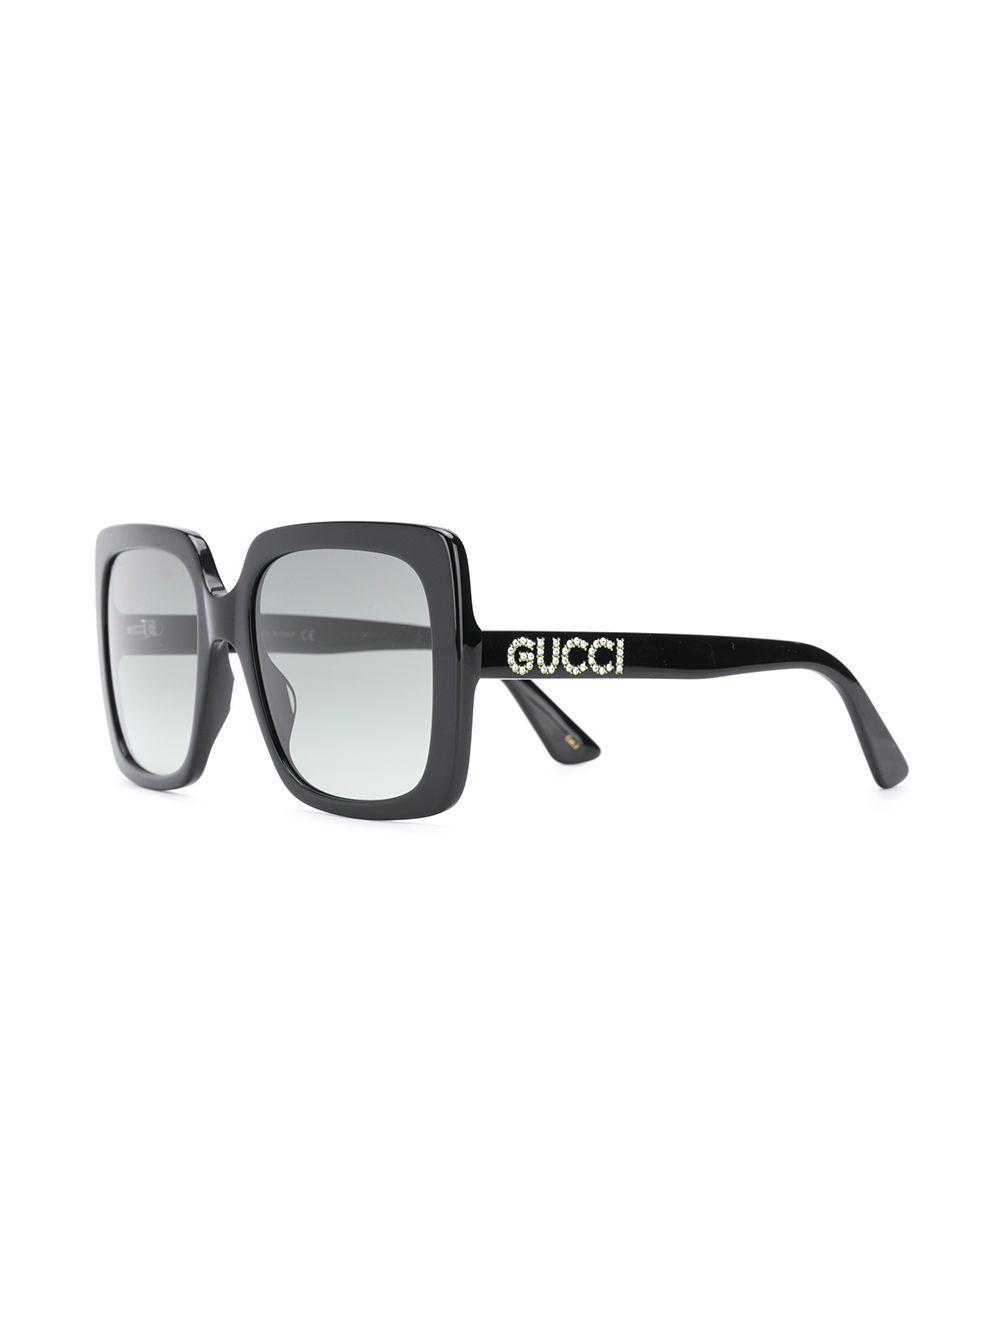 914387c1ac0 Gucci Mass Large Square Sunglasses in Black - Lyst